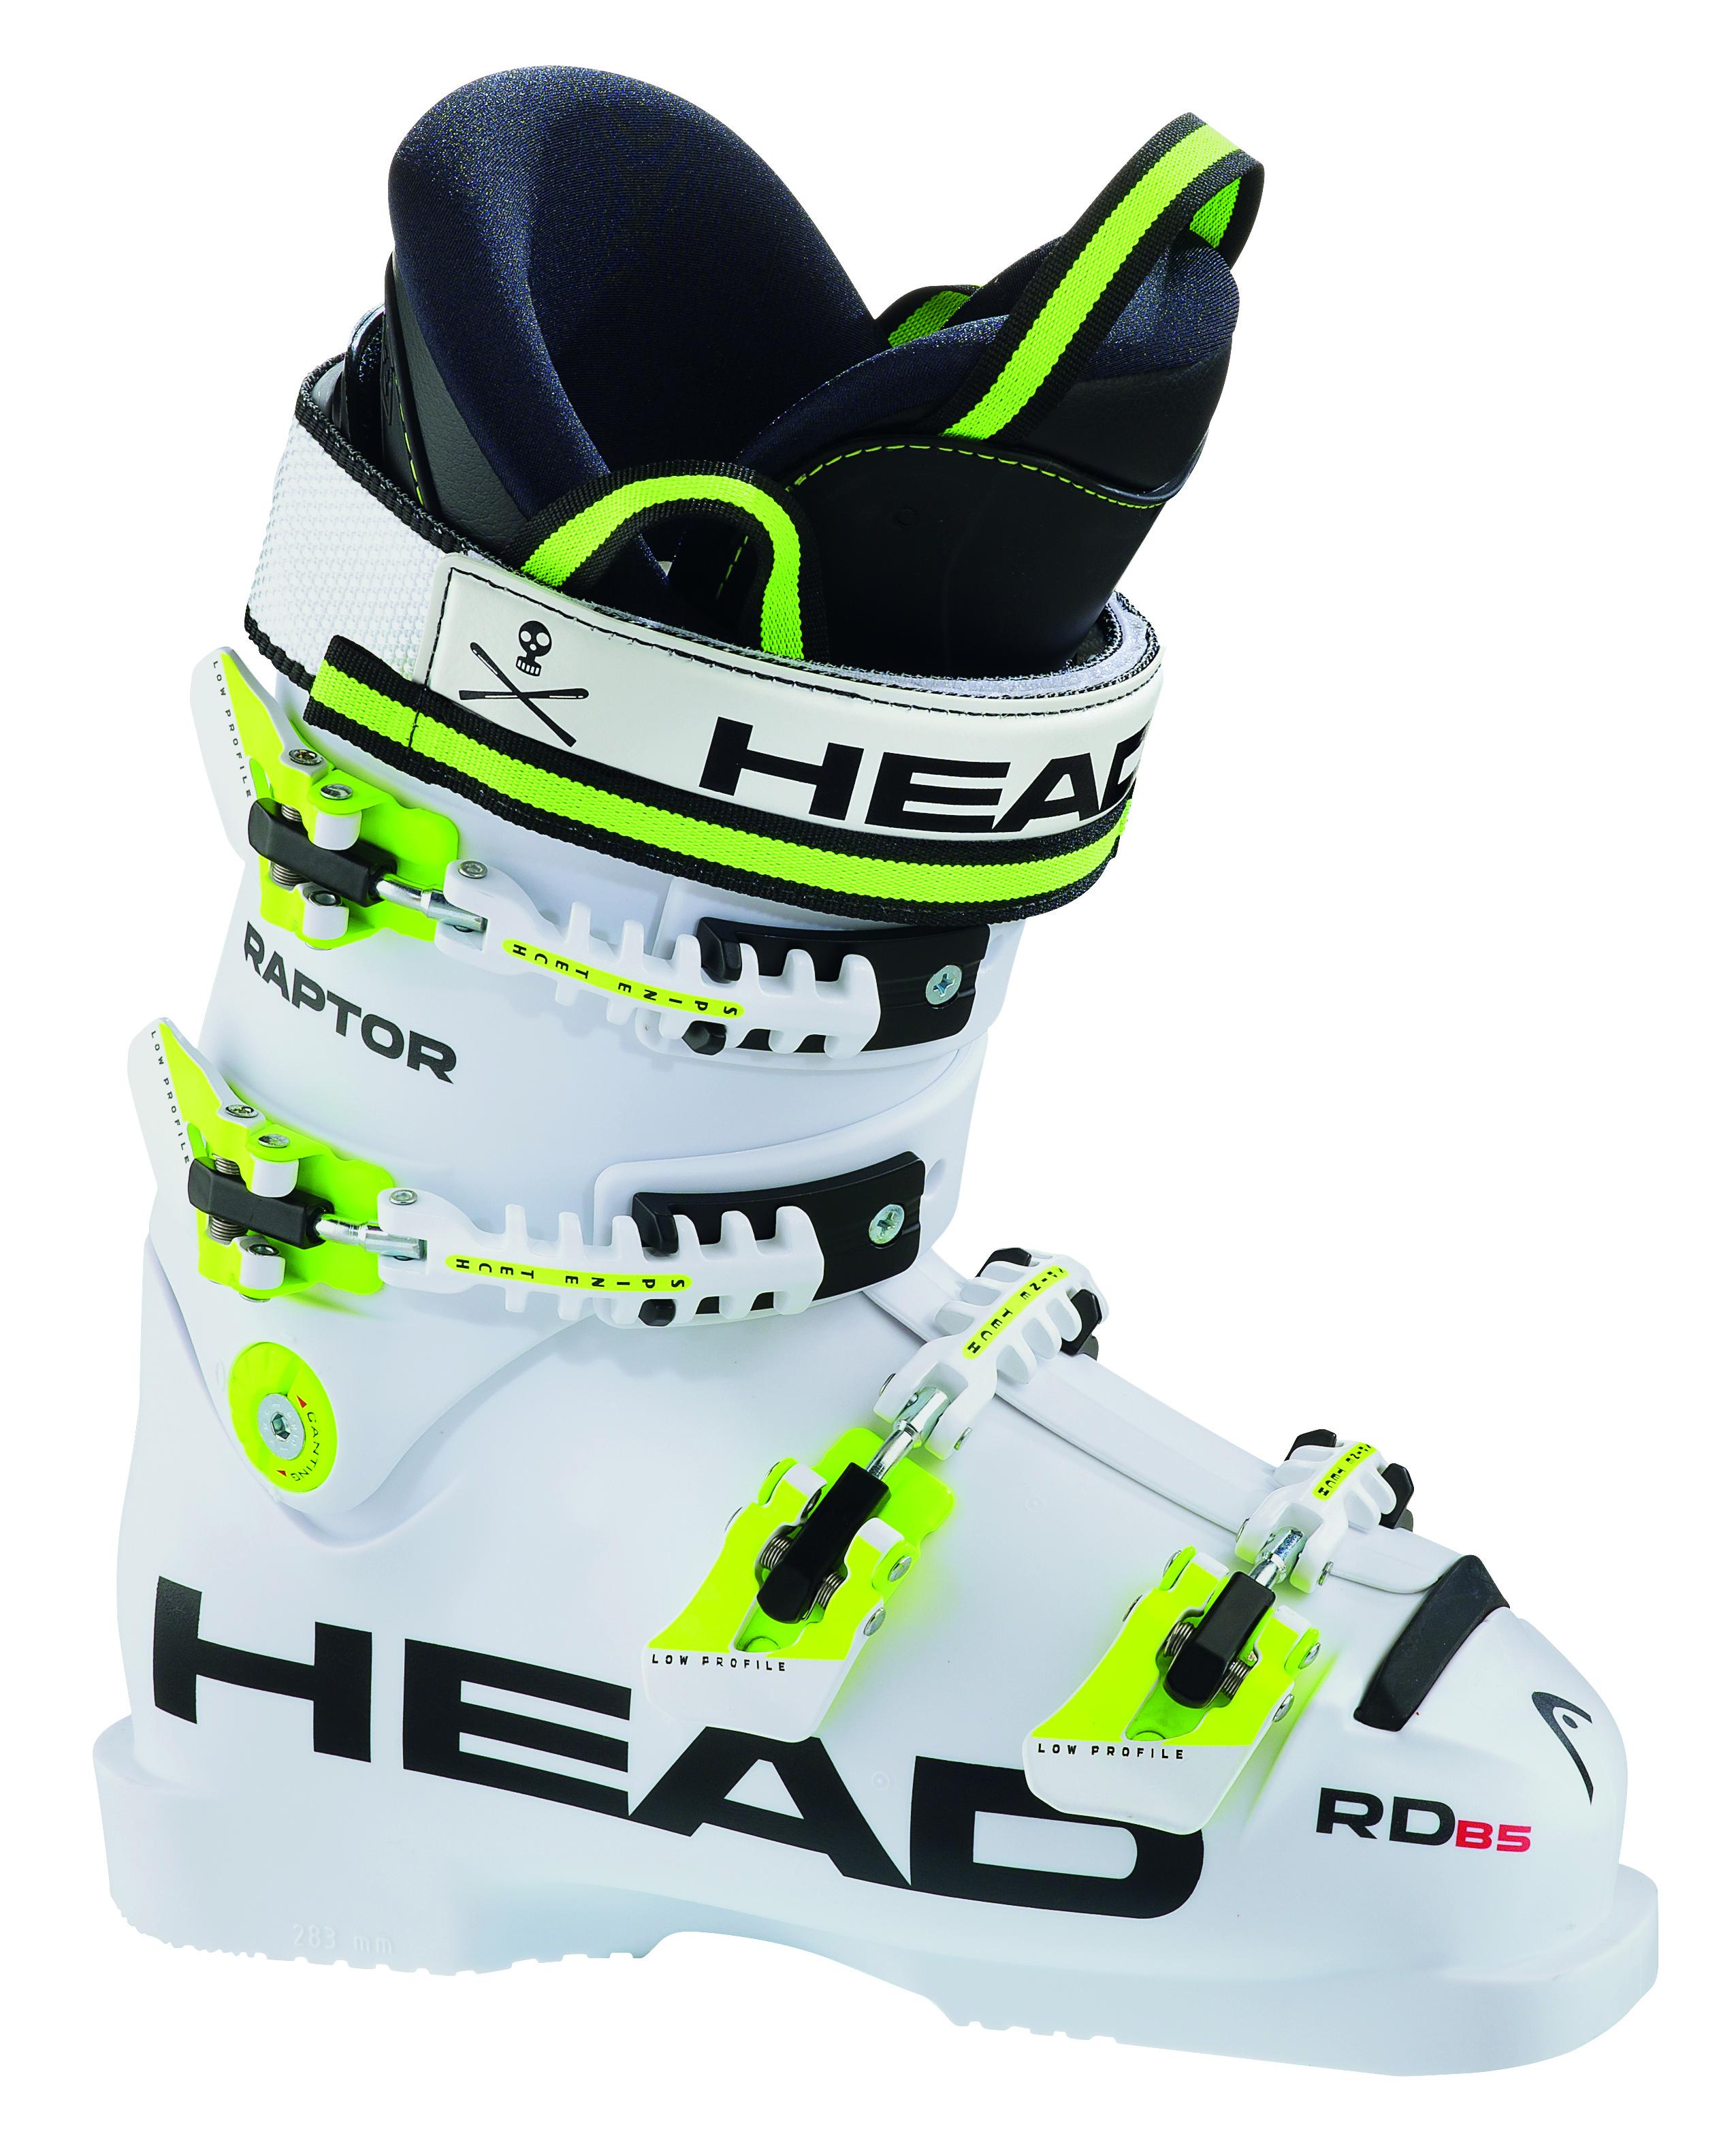 Head Raptor B5 Skiracing Com